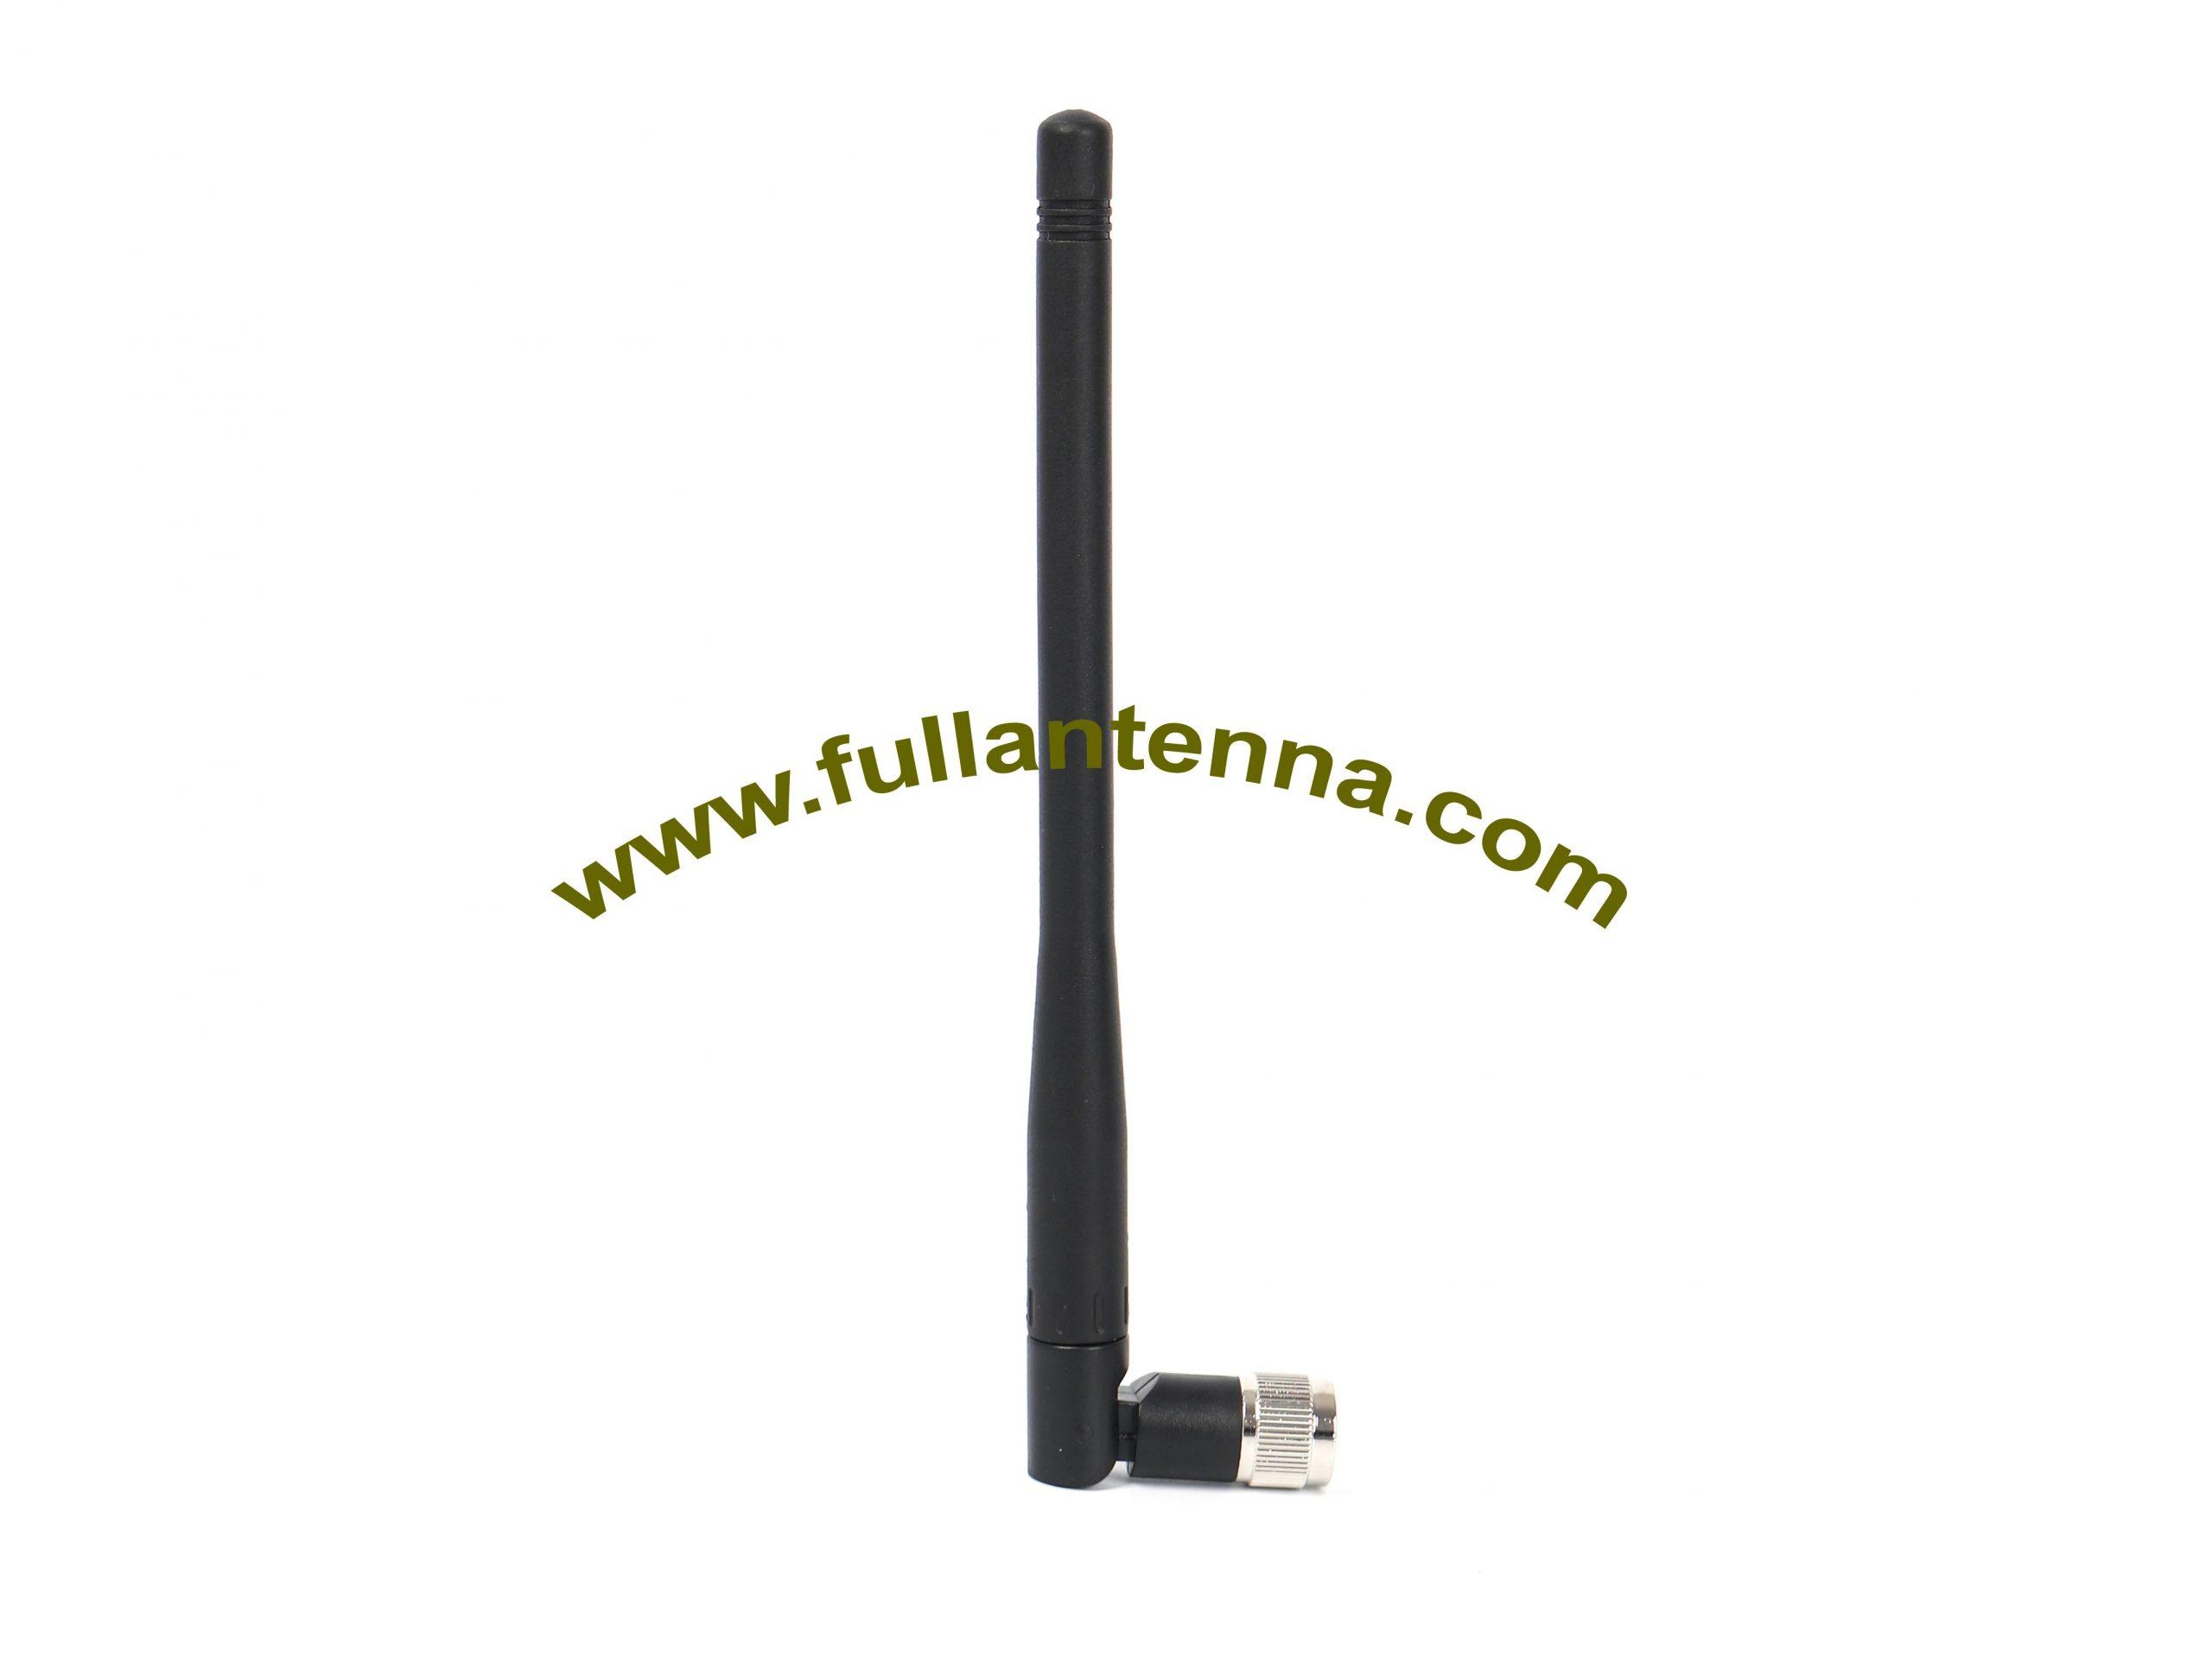 P/N:FALTE.0303,4G/LTE Rubber Antenna,4G  LTE Aerial  hot sale SMA rotation male 3dbi Gain